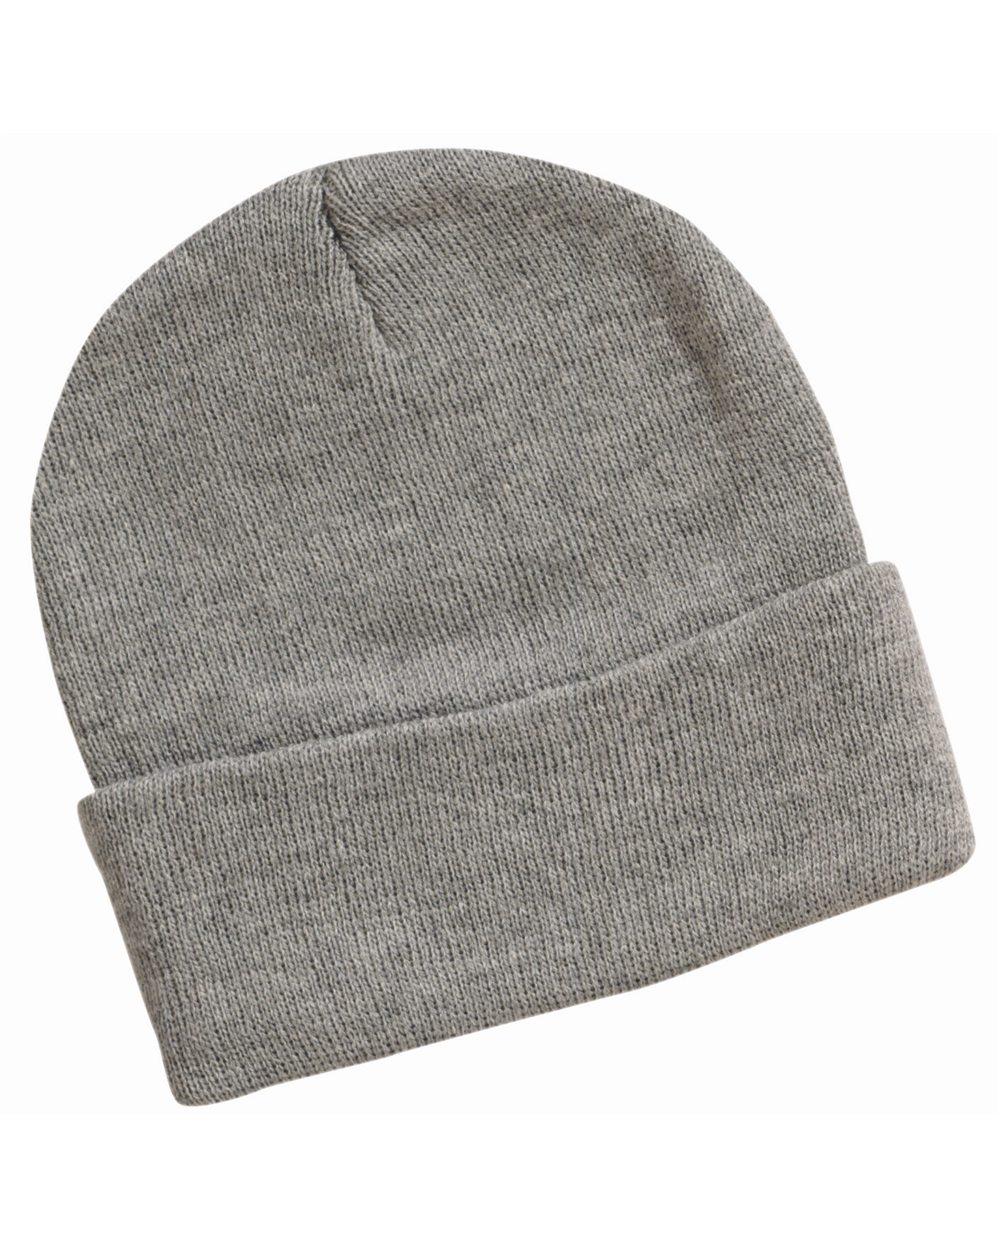 knit beanie model shot IUJNWNV